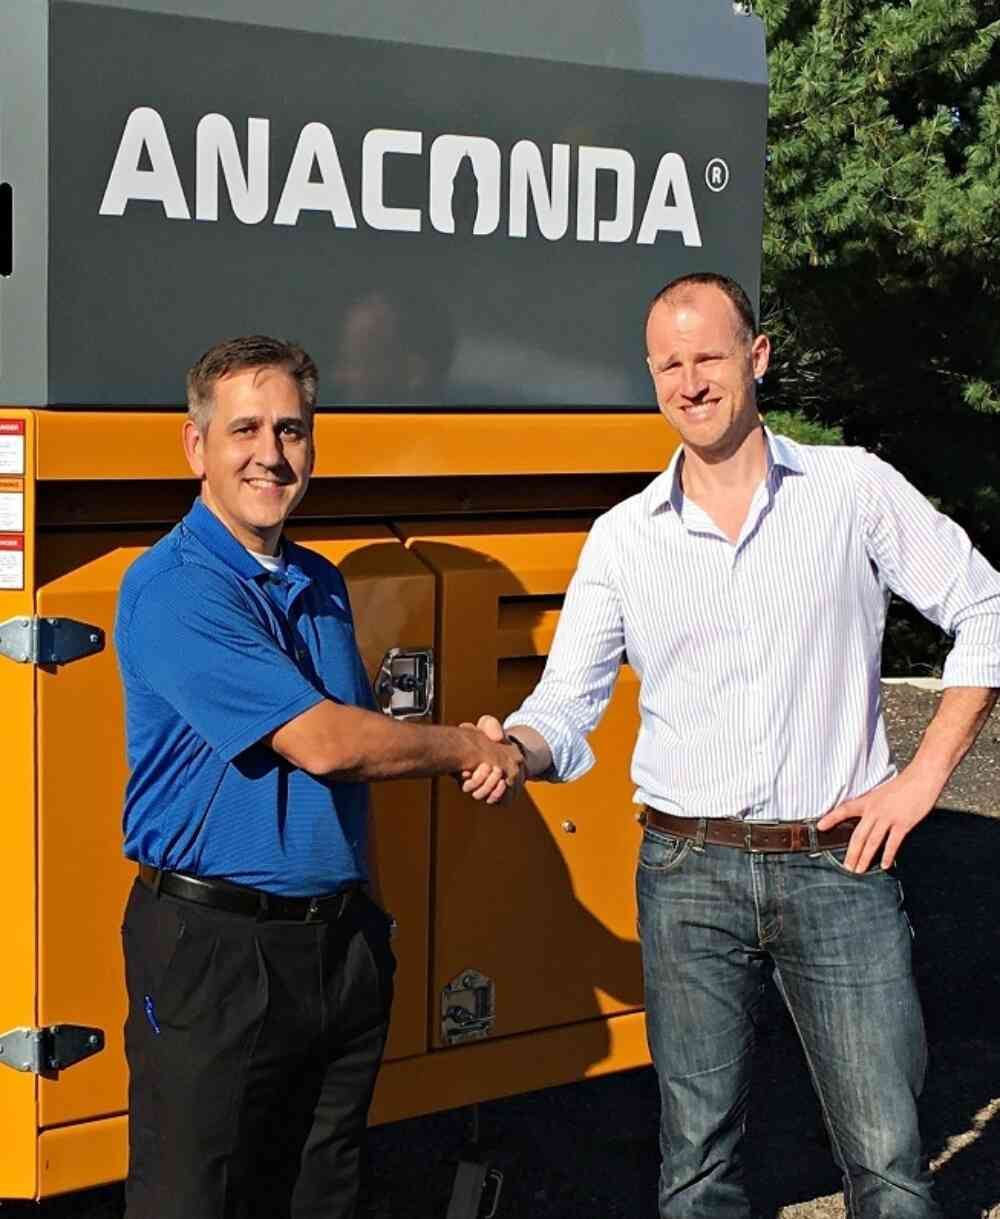 Anaconda Acquisition